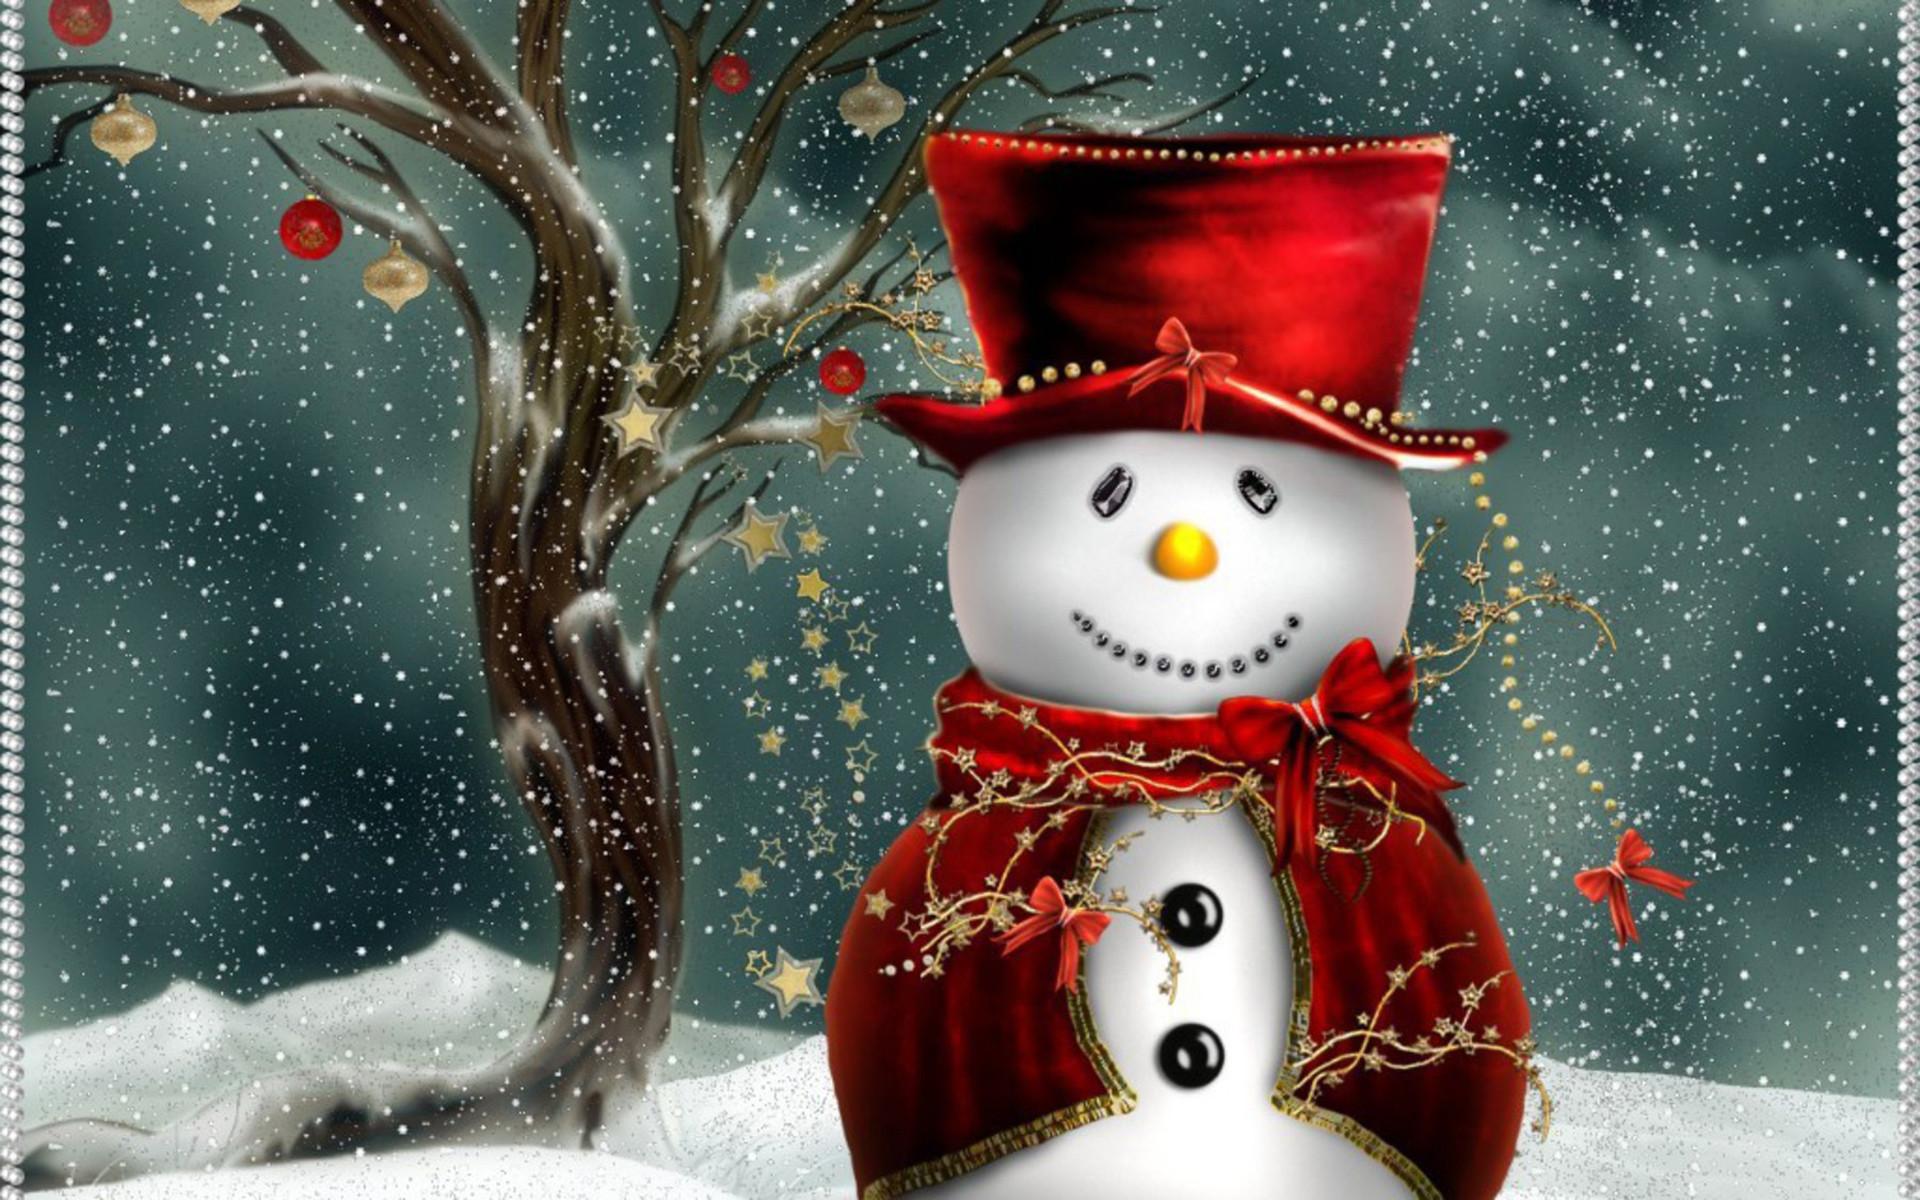 free desktop wallpaper of cute christmas snowman free computer desktop